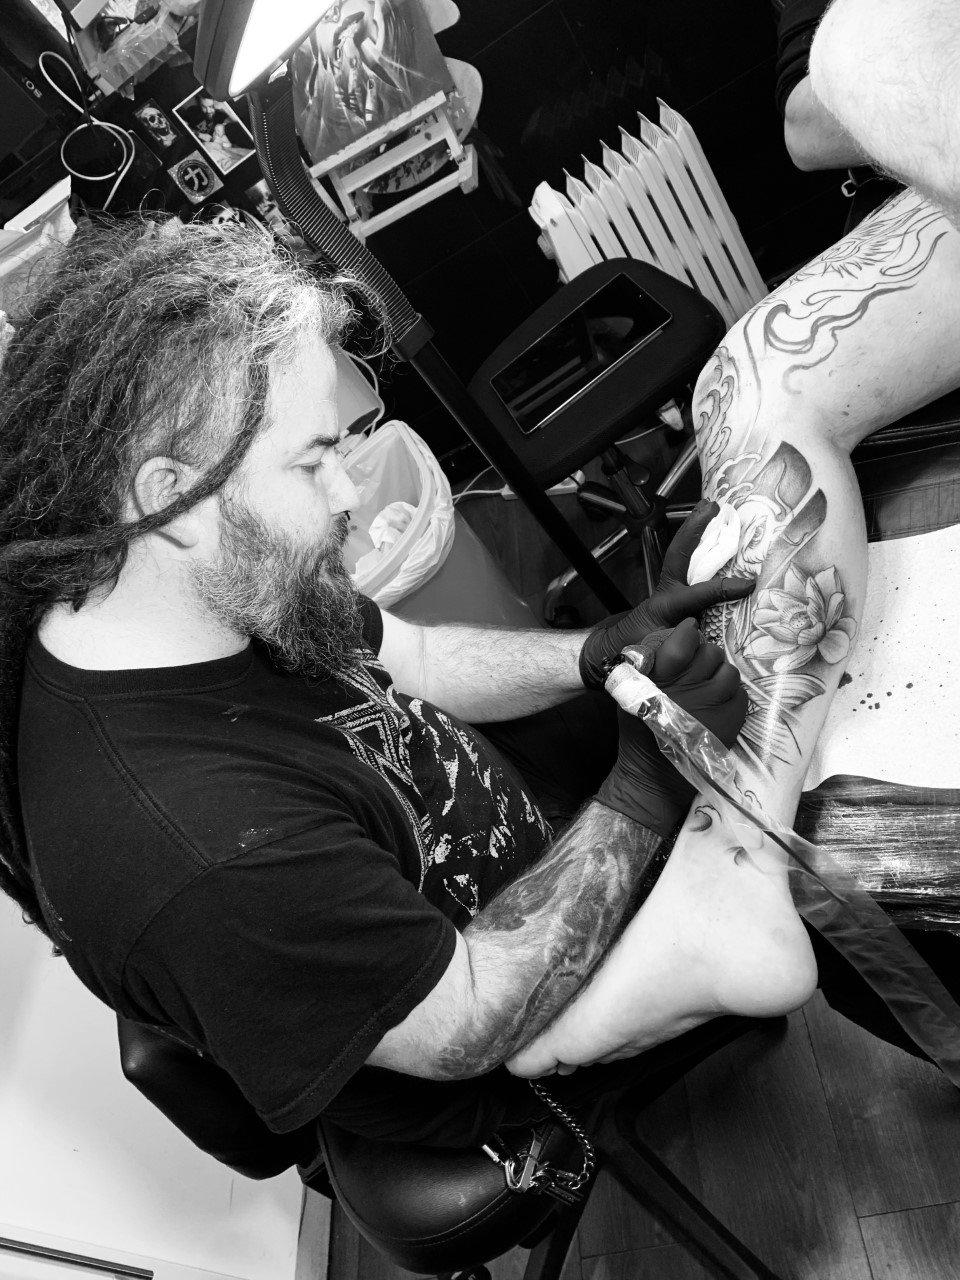 tattoo_artists_undergroundtattoos_EN1 1YY UK